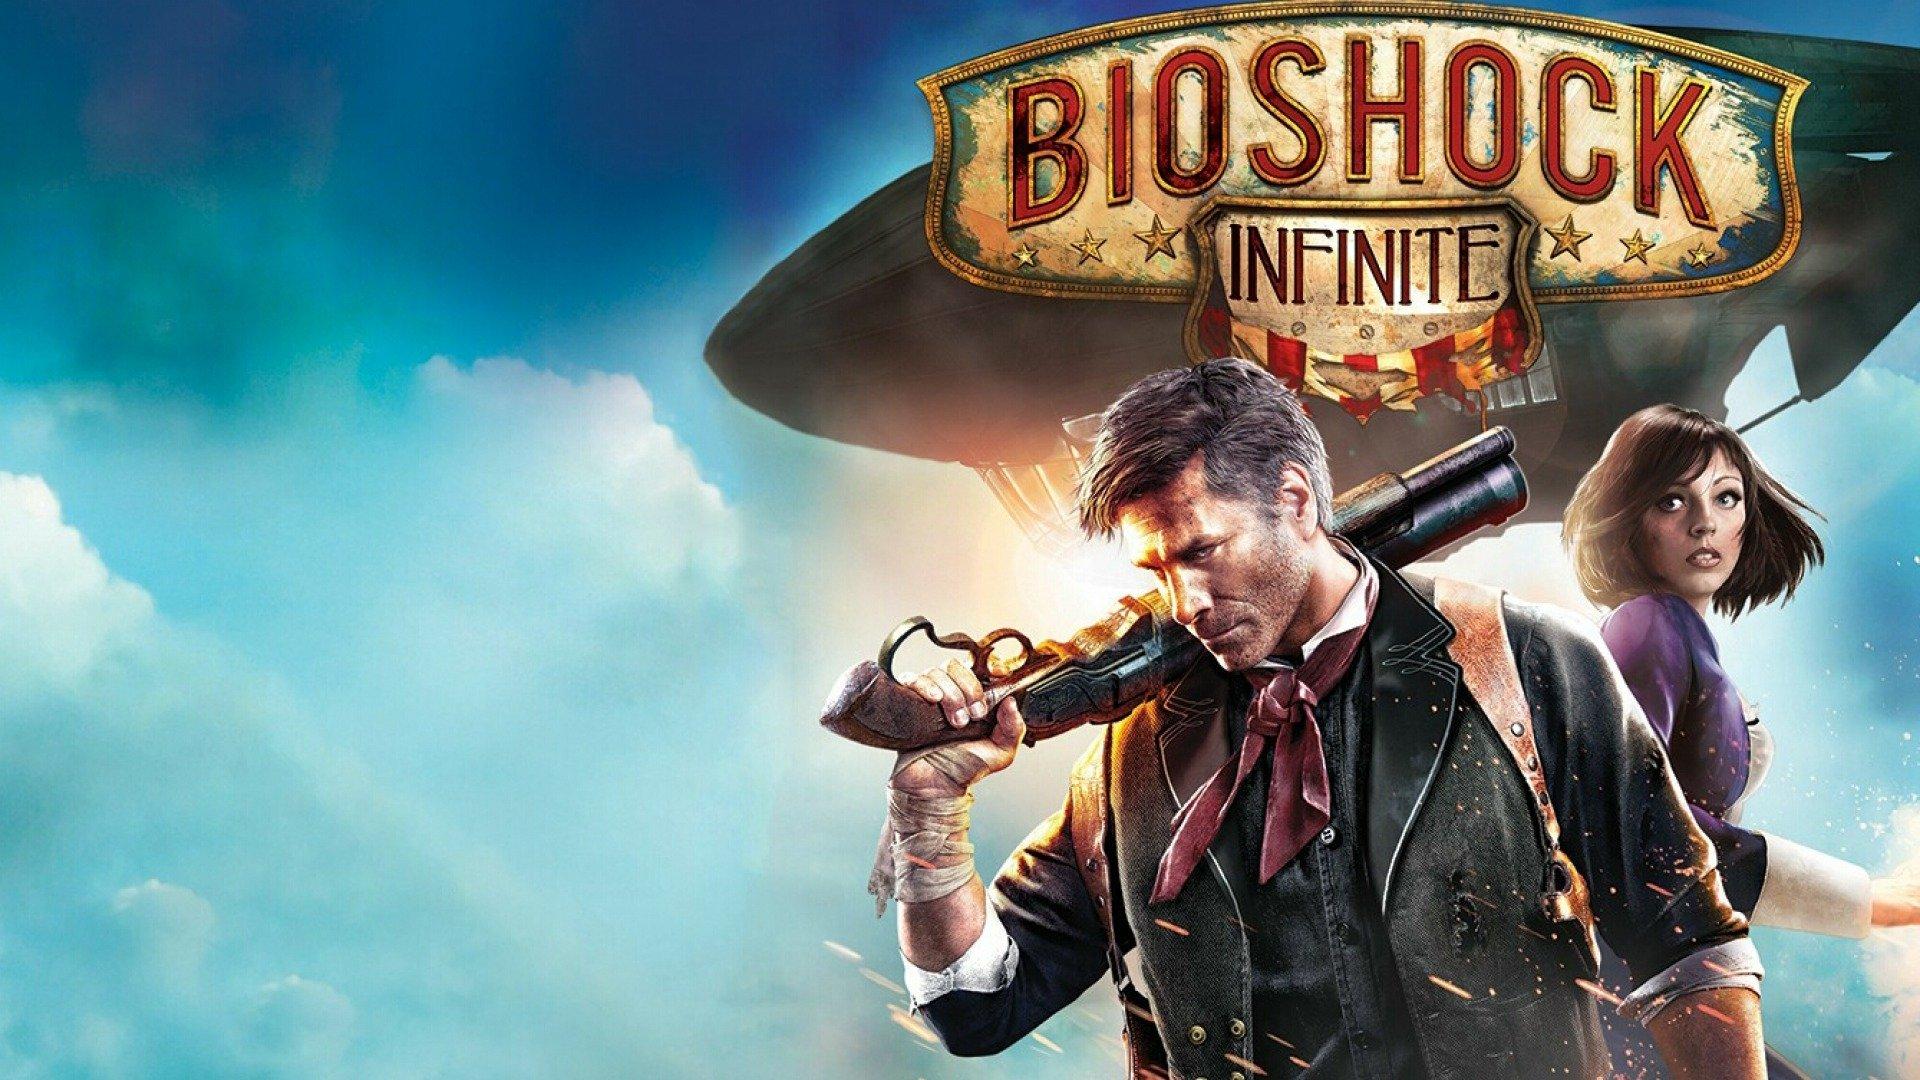 BioShock Infinite action pc game 2013